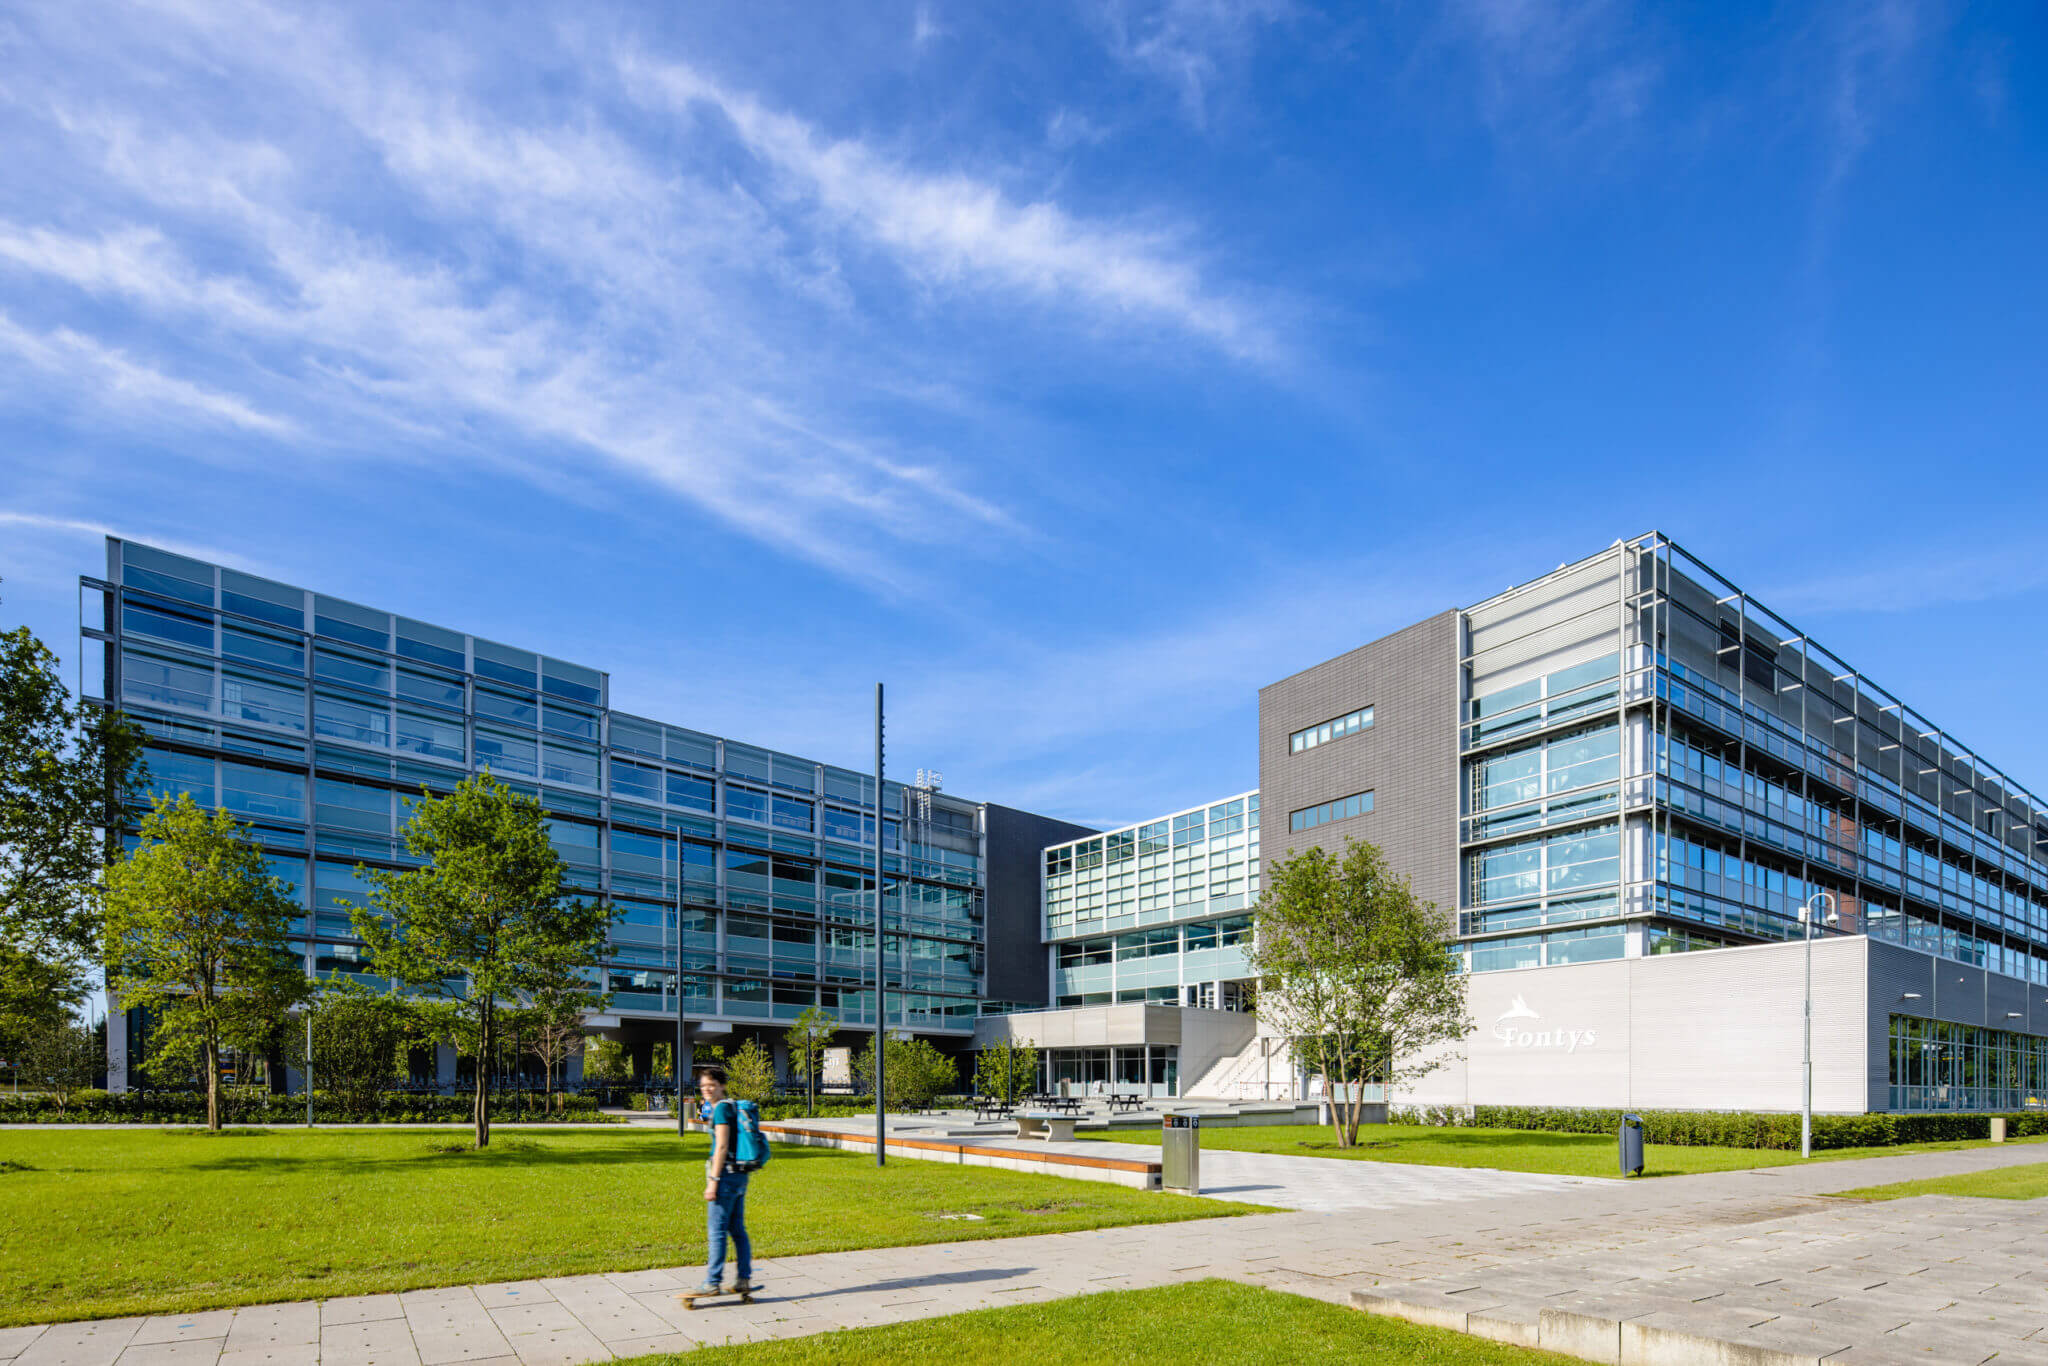 campus tue fontys applied science automotive eindhoven